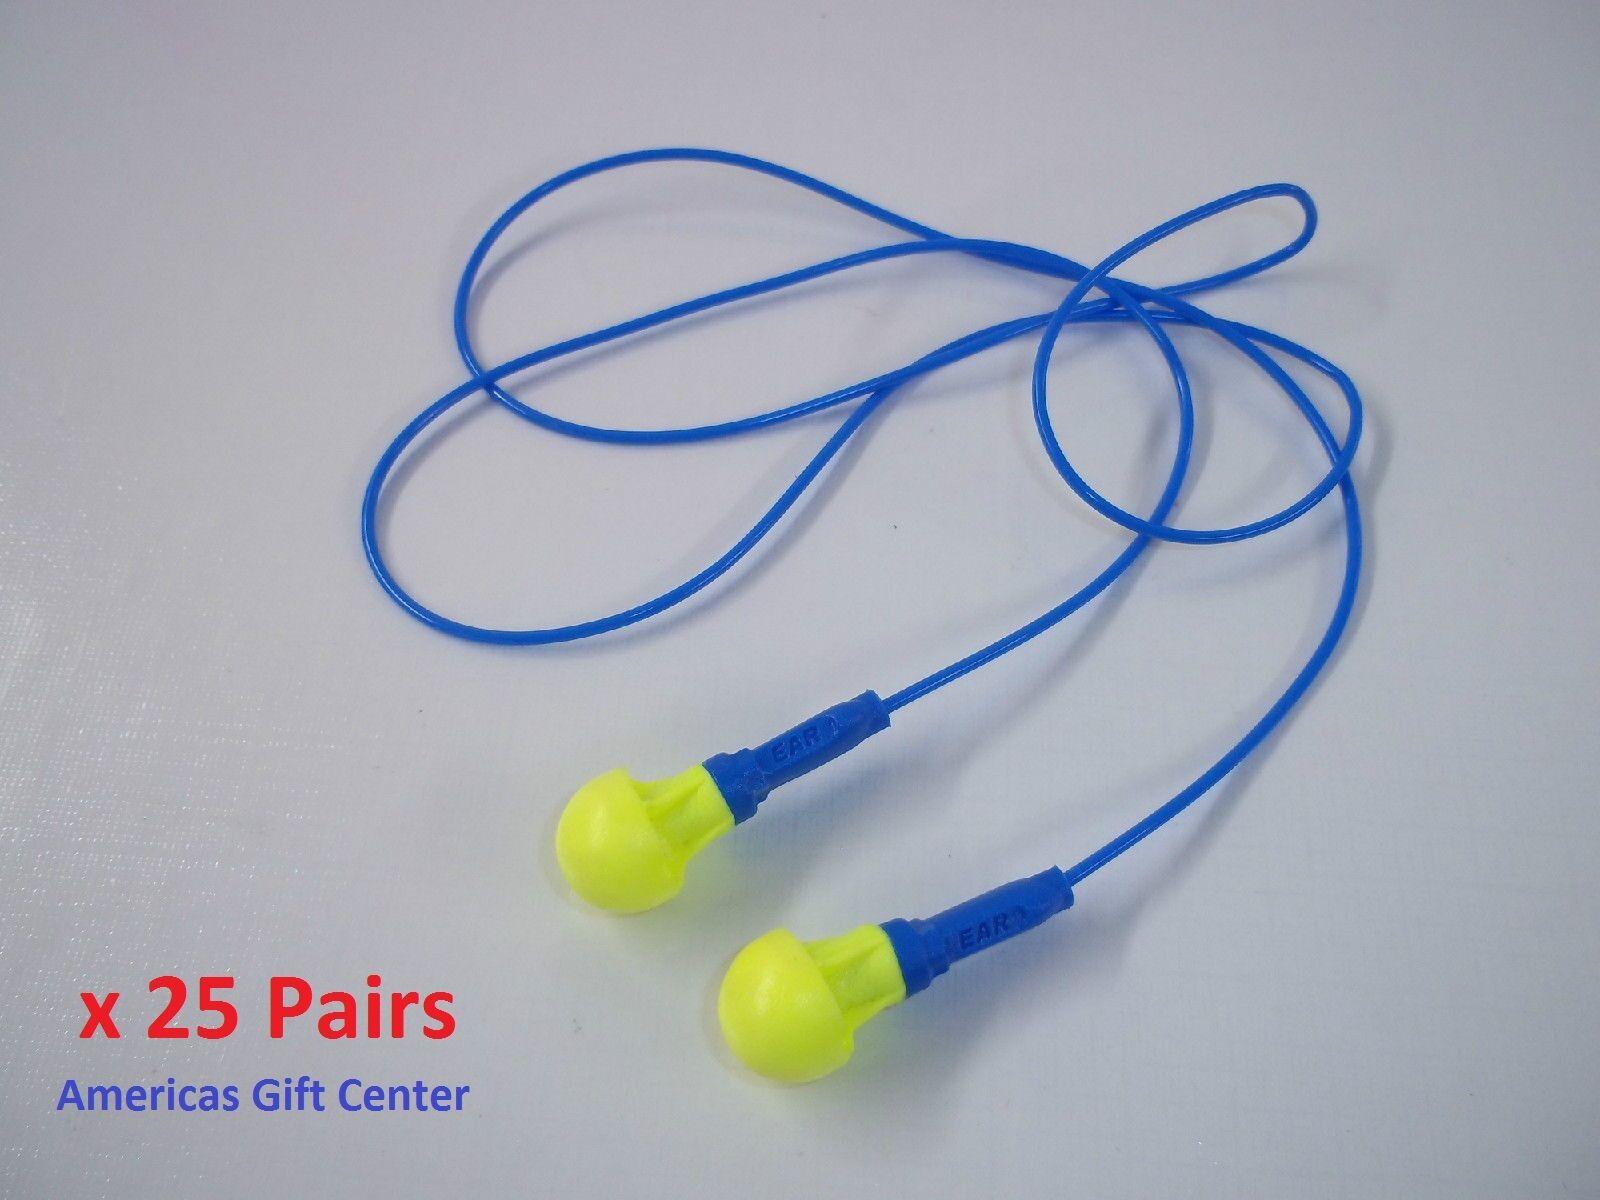 25 Pairs Earplugs 3M Push-Ins Corded Earplug Hearing